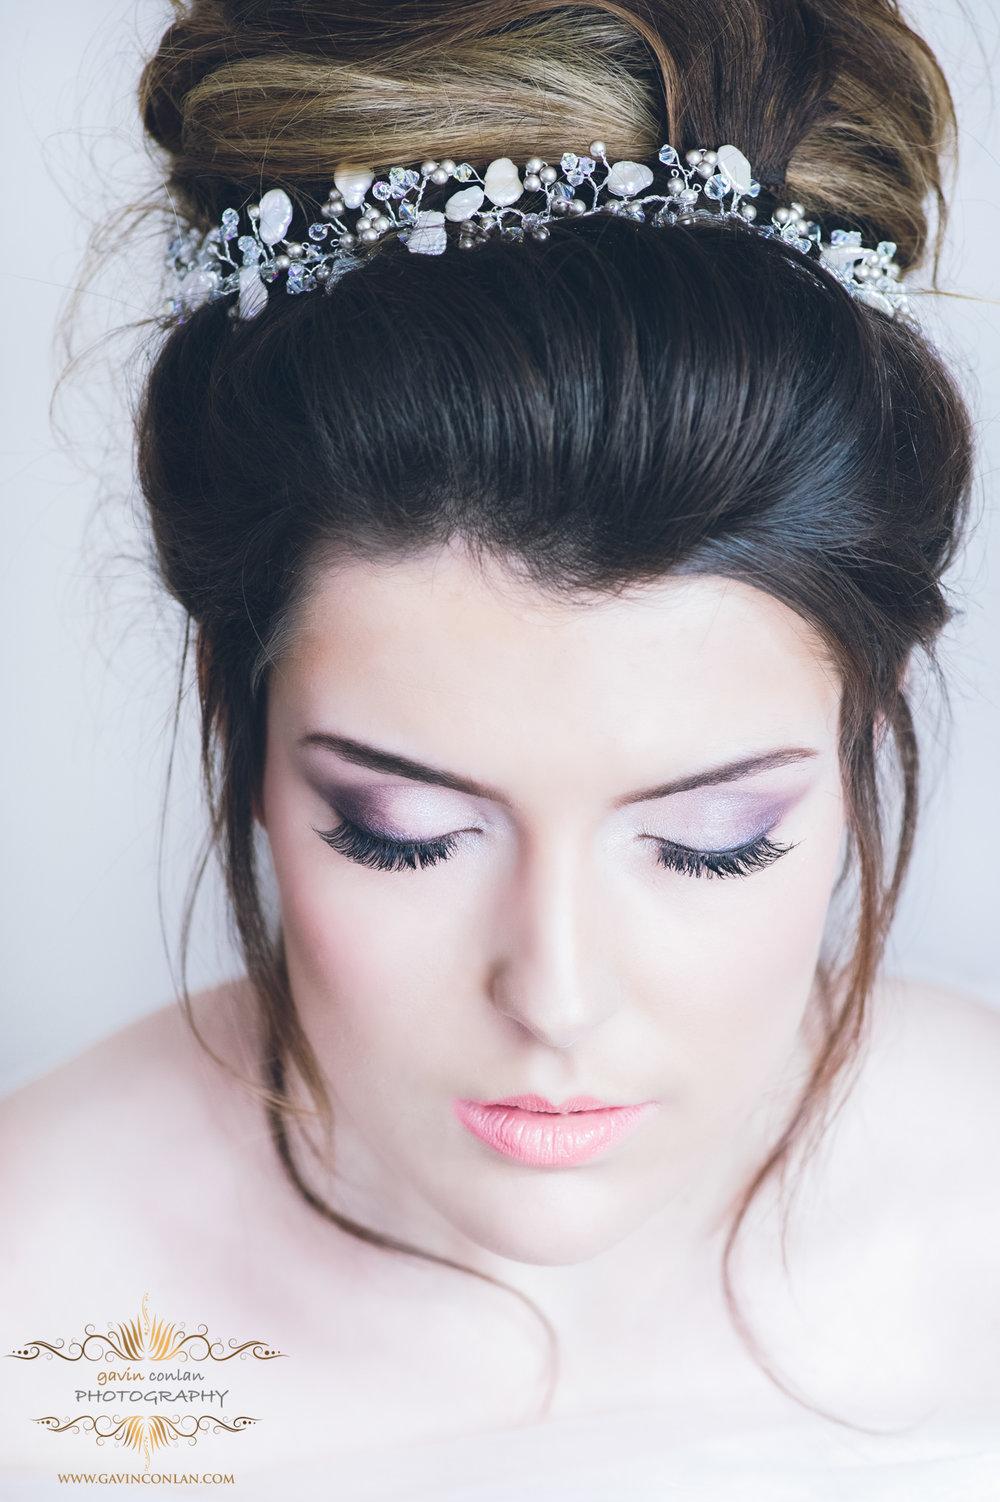 creative-bridal-hair-make-up-jewellery-photo-shoot-gavinconlanphotography-03